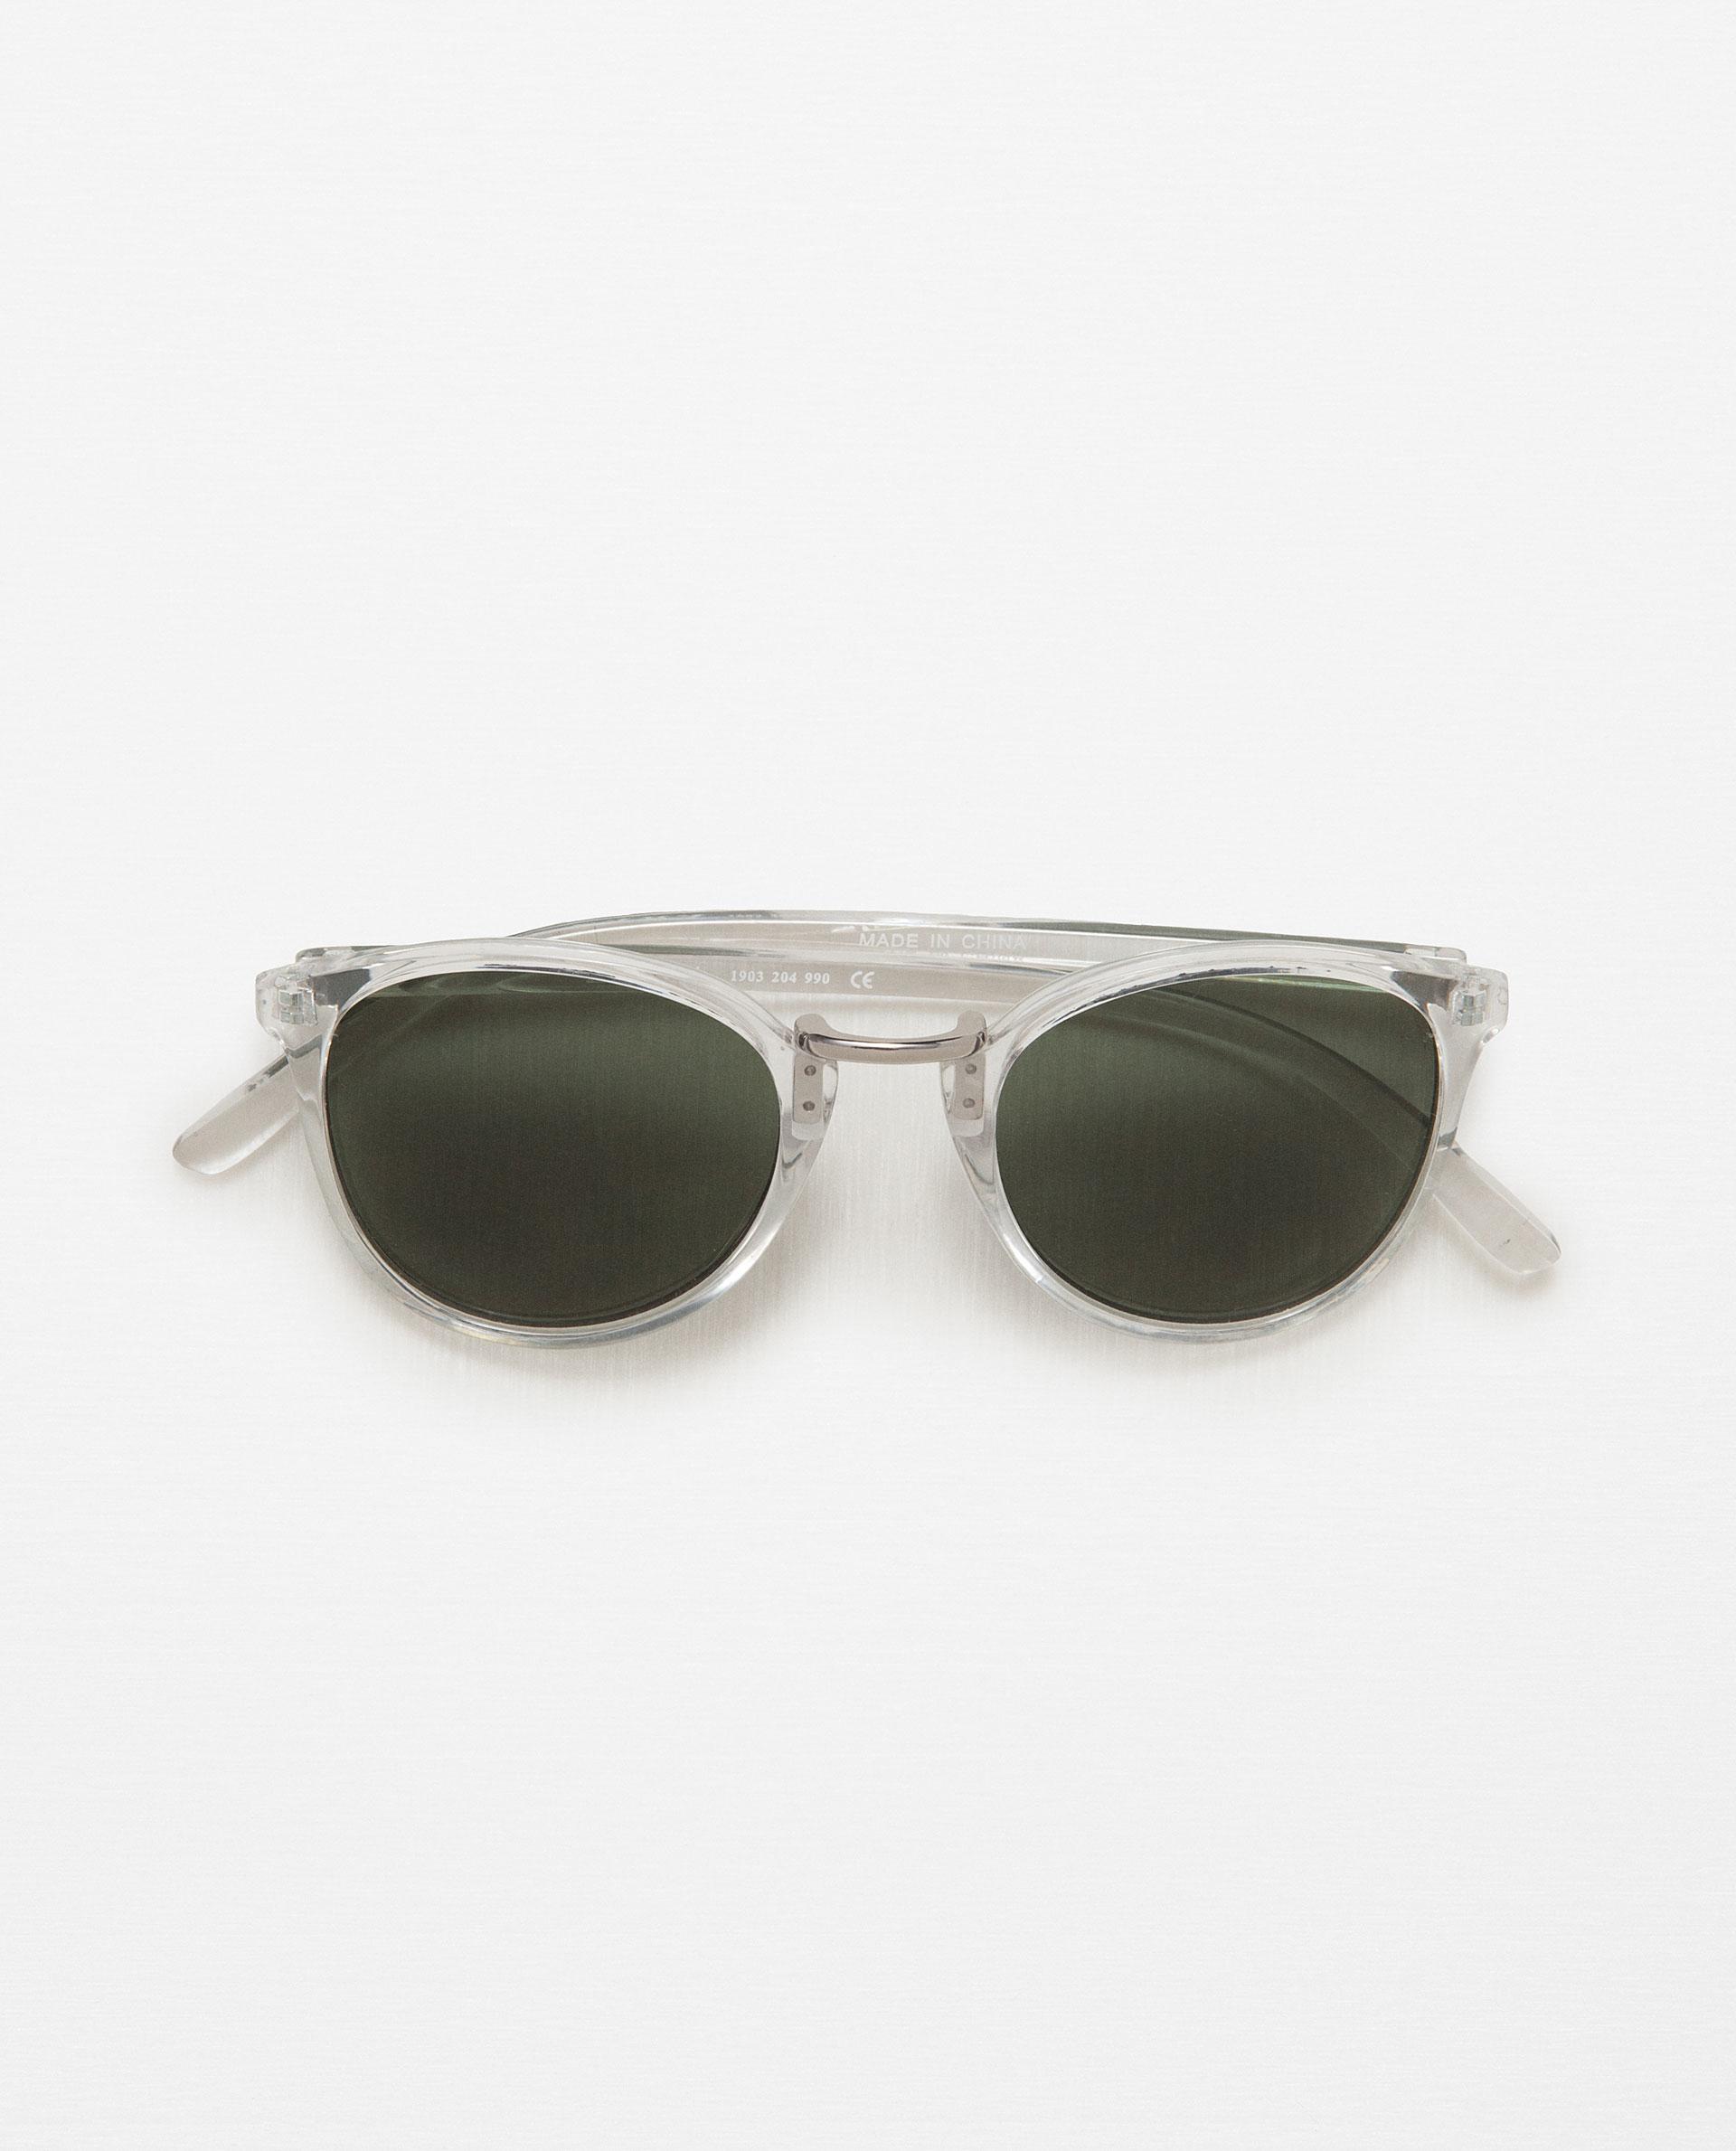 Zara Glasses Frames : Zara Glasses With Transparent Frame Lyst